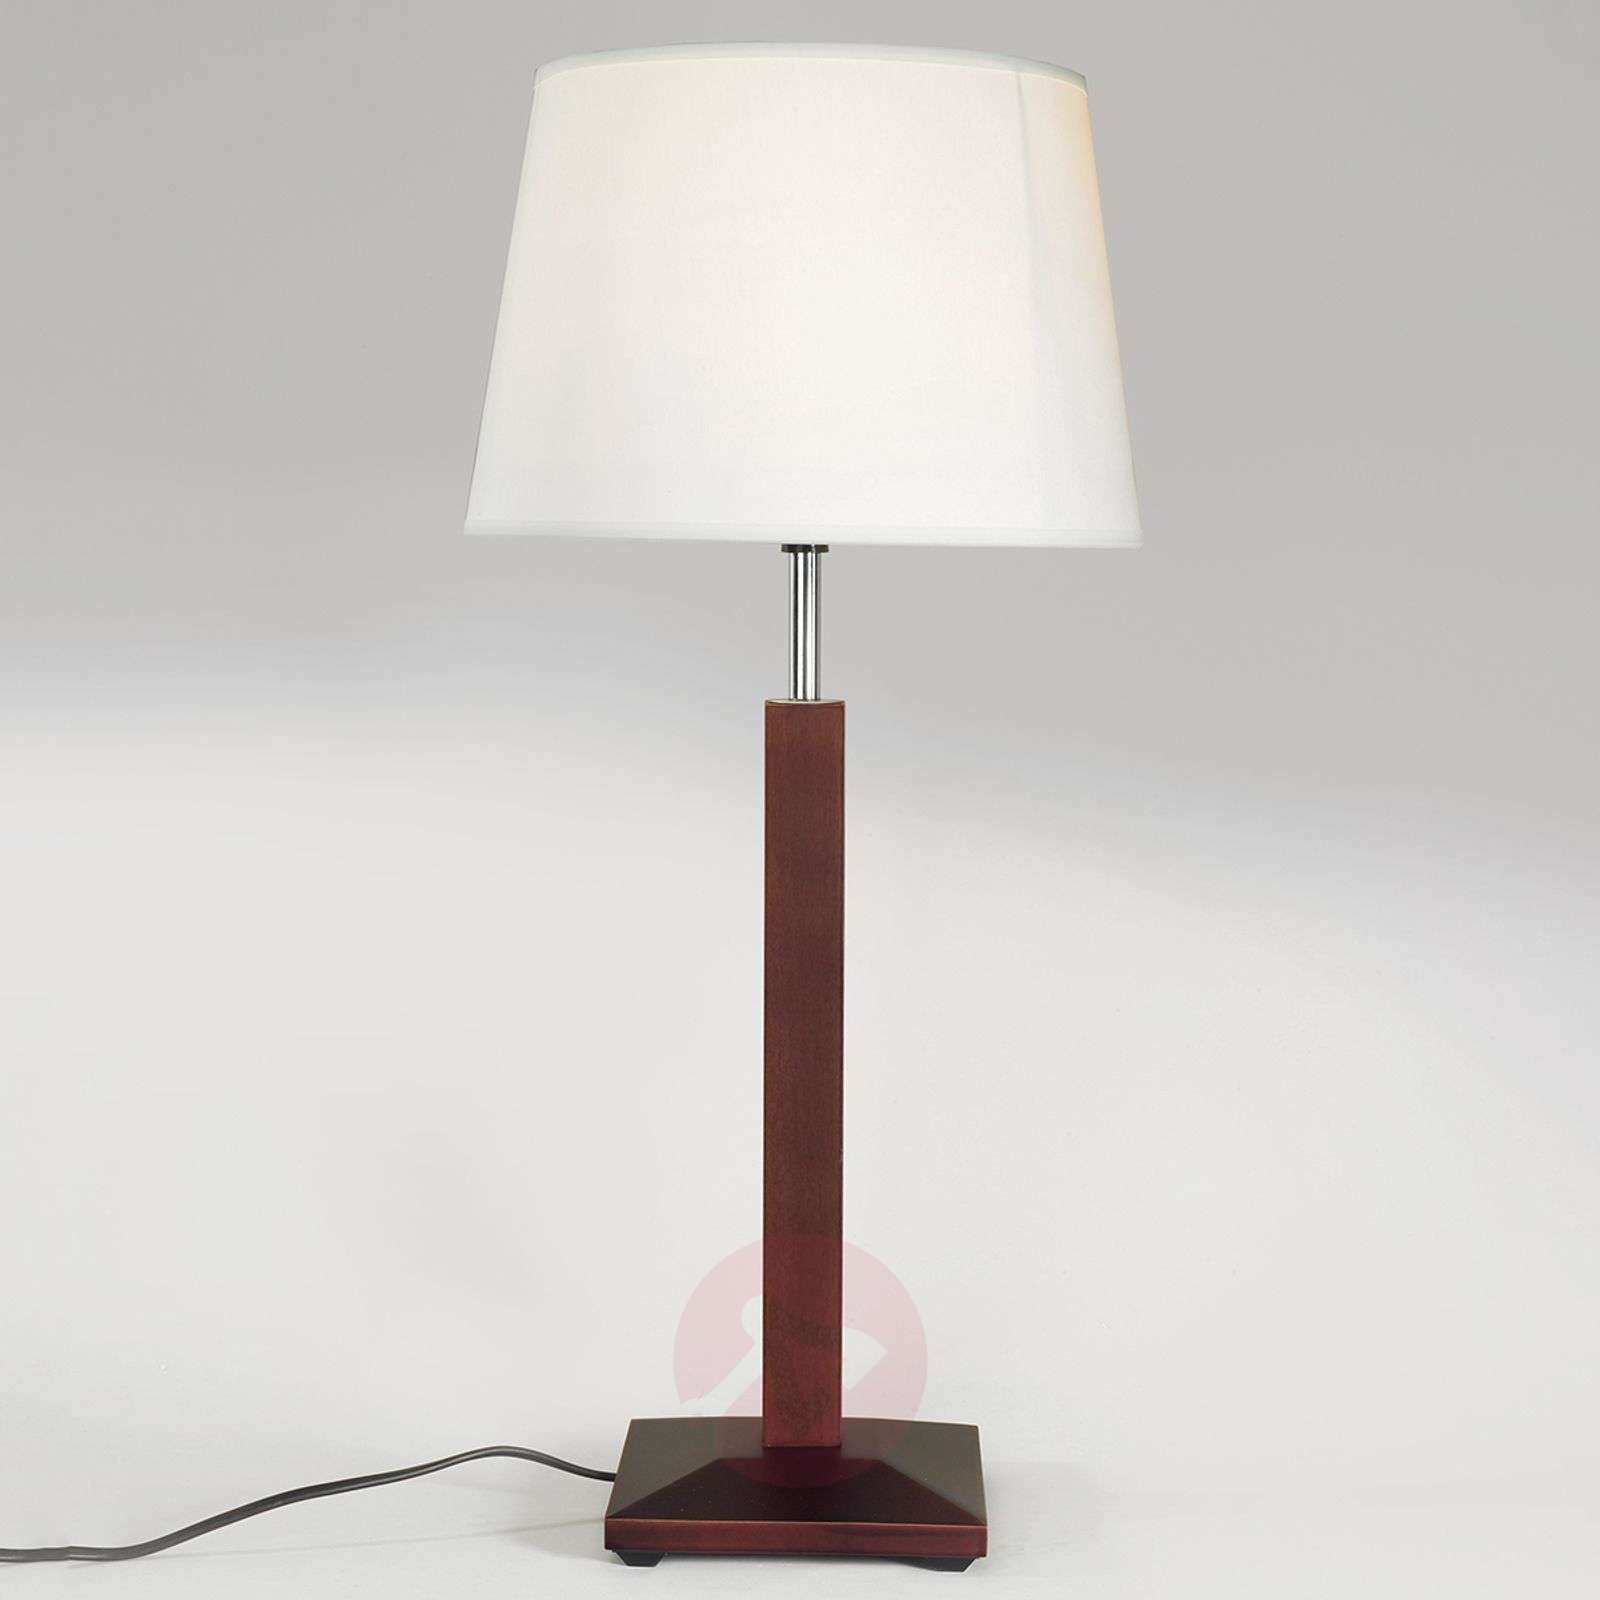 Zanzibar lt table lamp, ebony-1065023-01